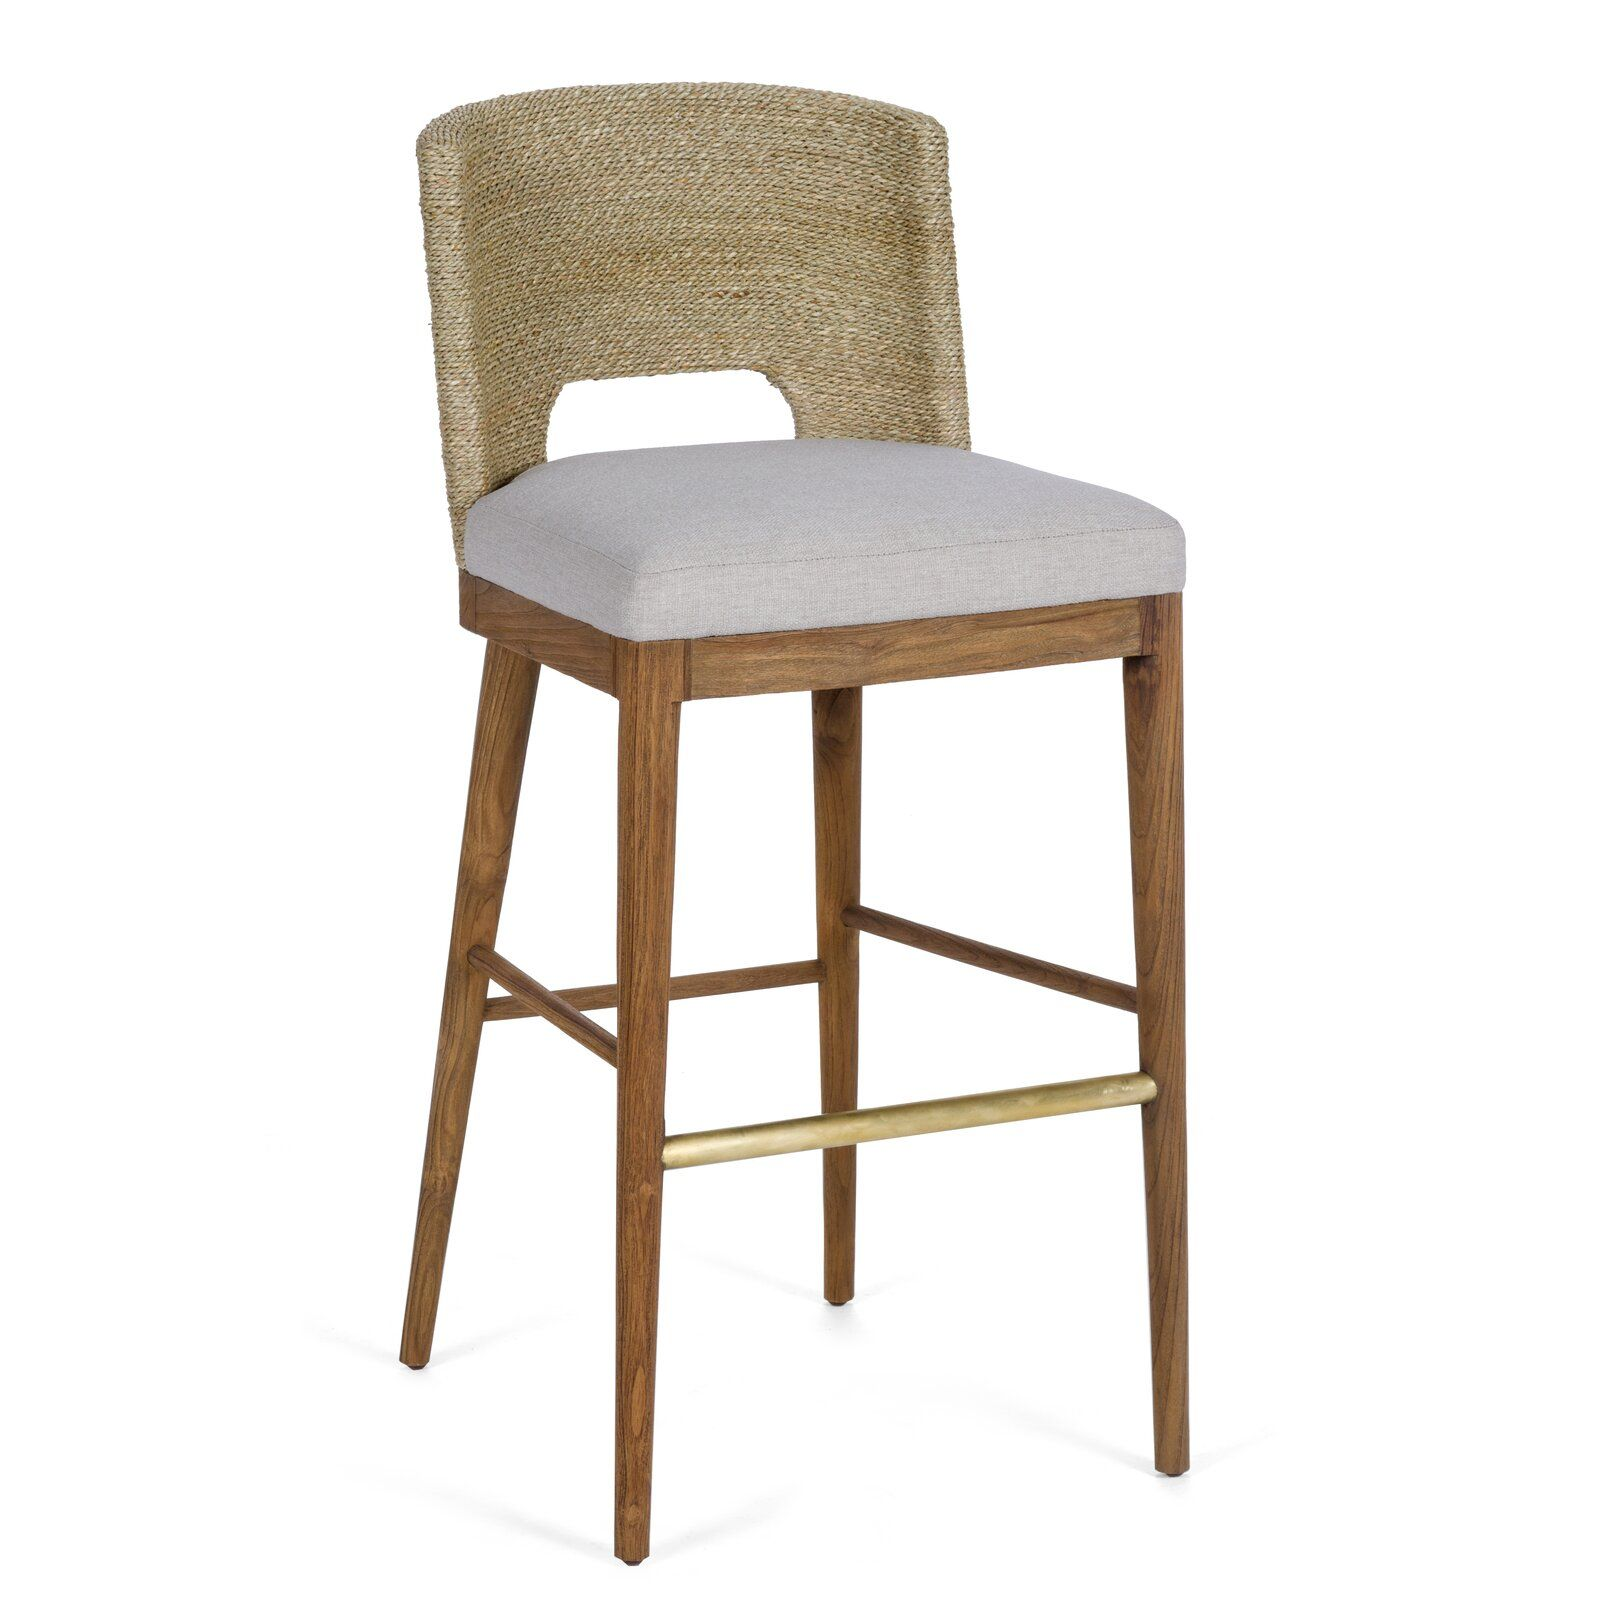 Amalfi 28 Bar Stool In 2020 Counter Stools Bar Stools Furniture